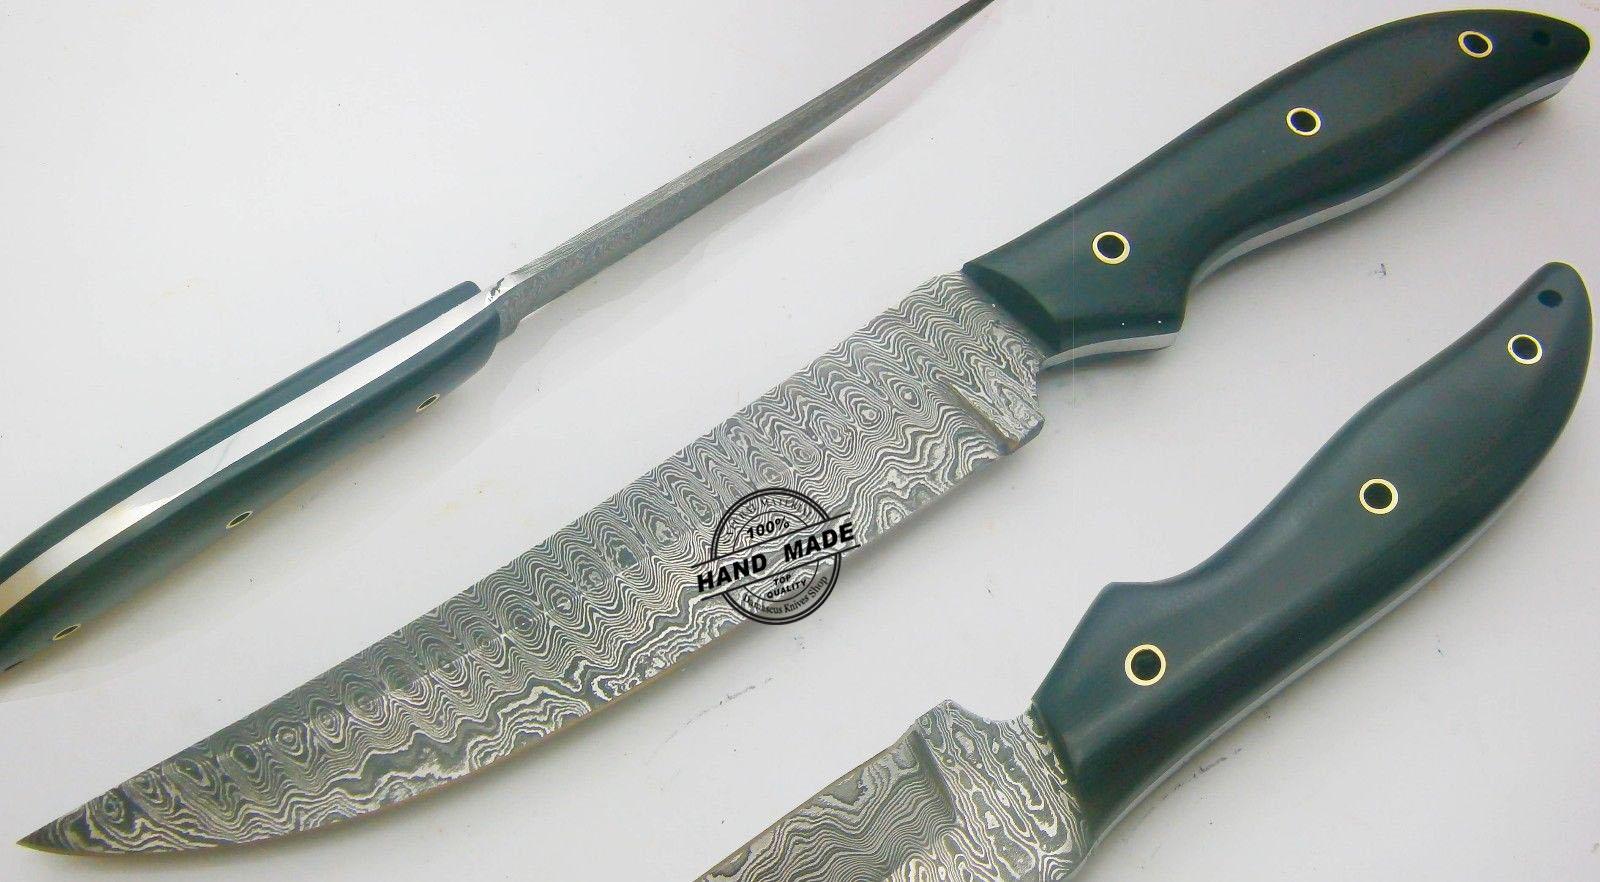 reviews damascus kitchen knives damascus kitchen knife kits damascus japanese kitchen knives review kitchen zone